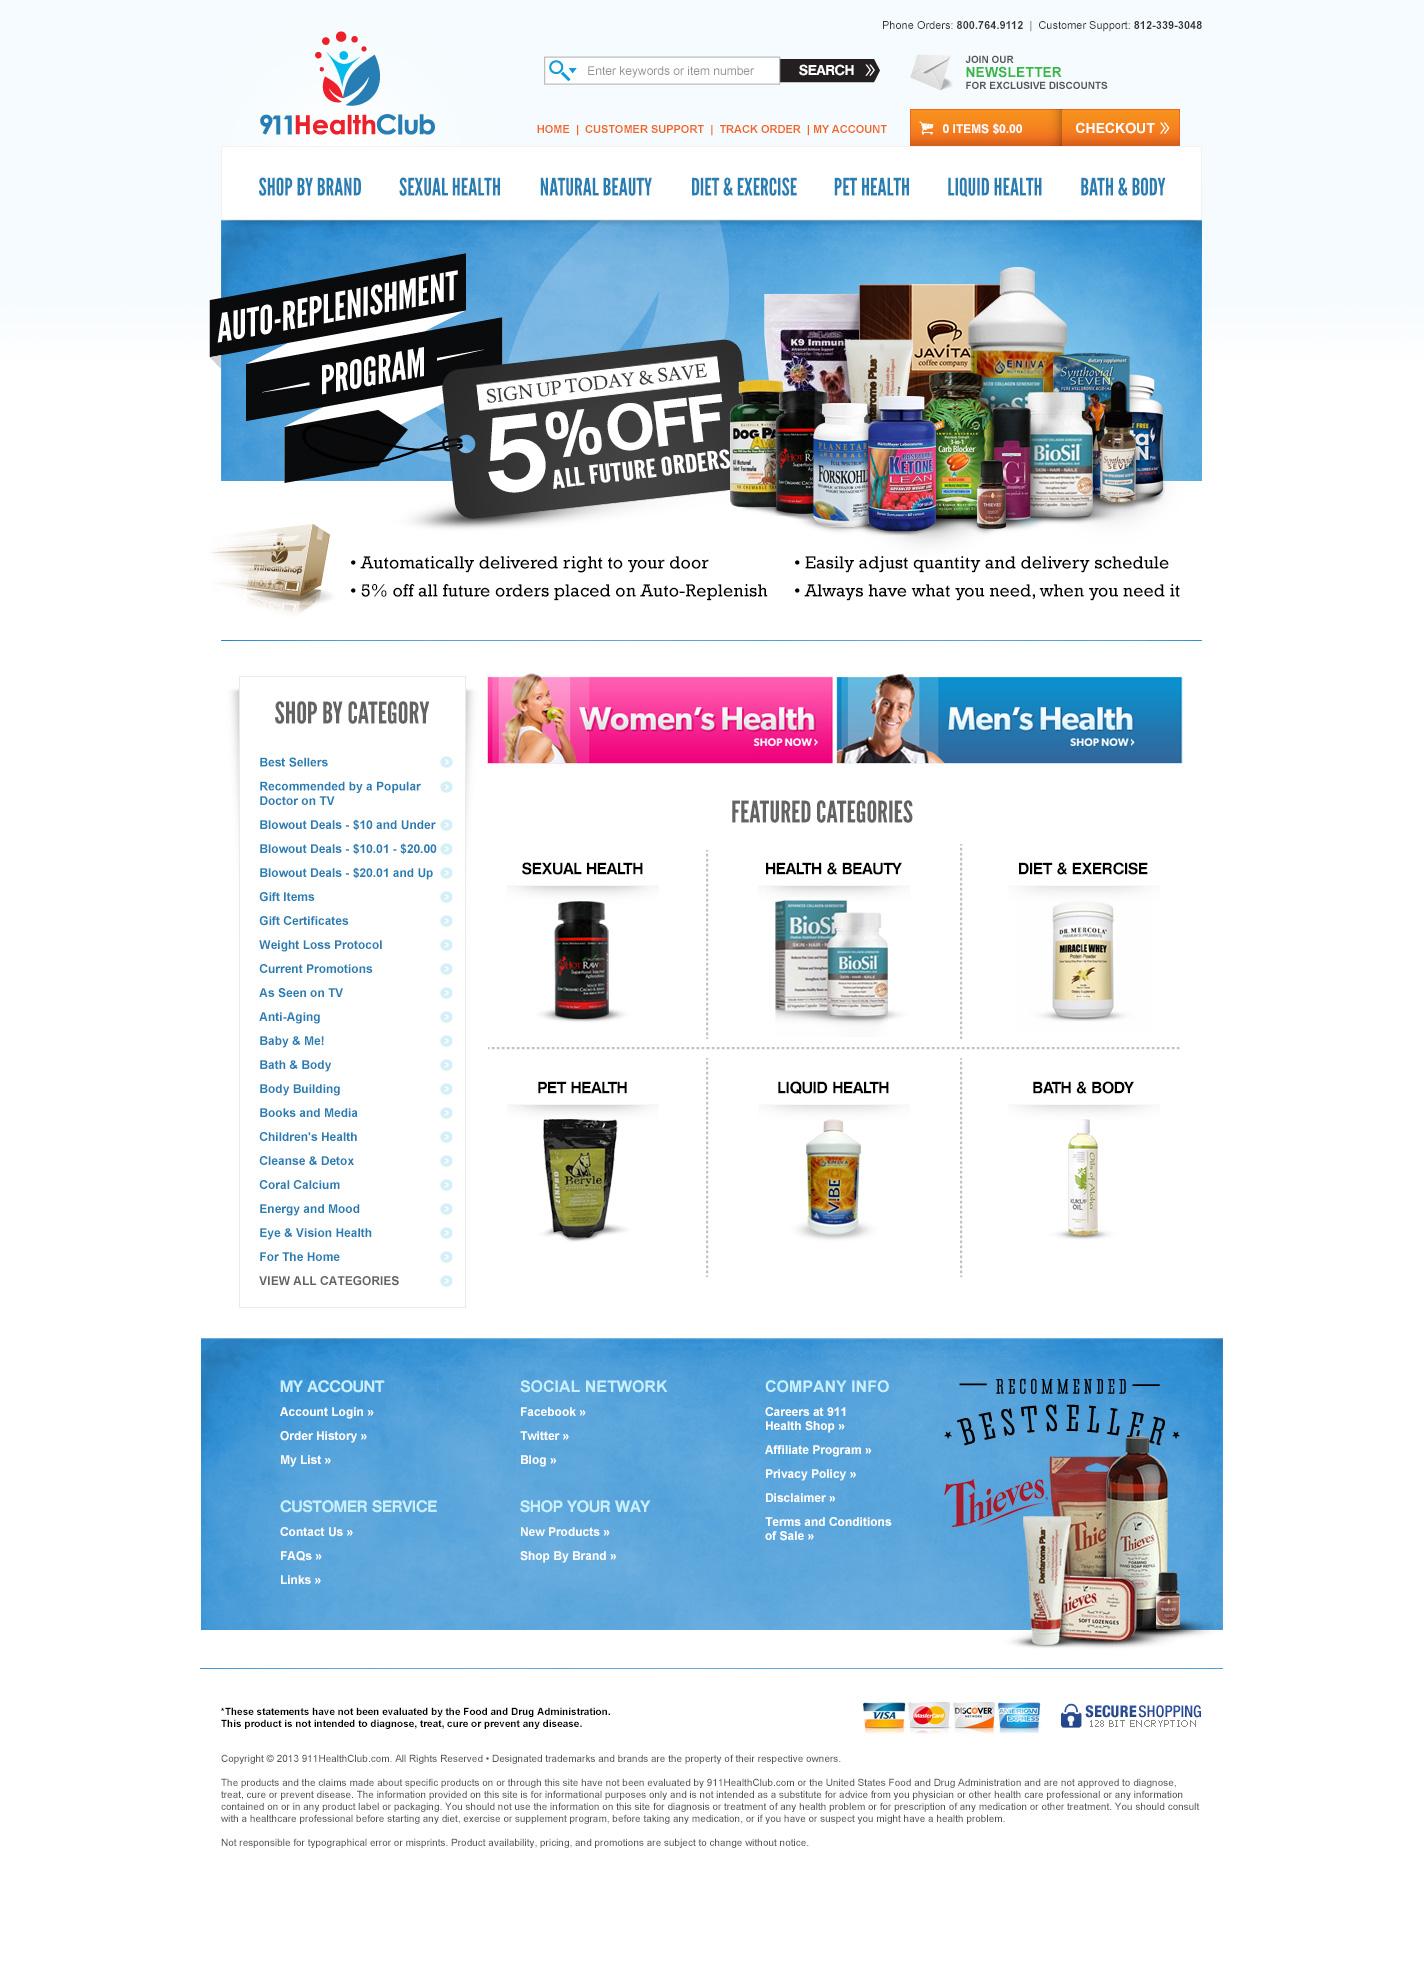 911HealthShop website design